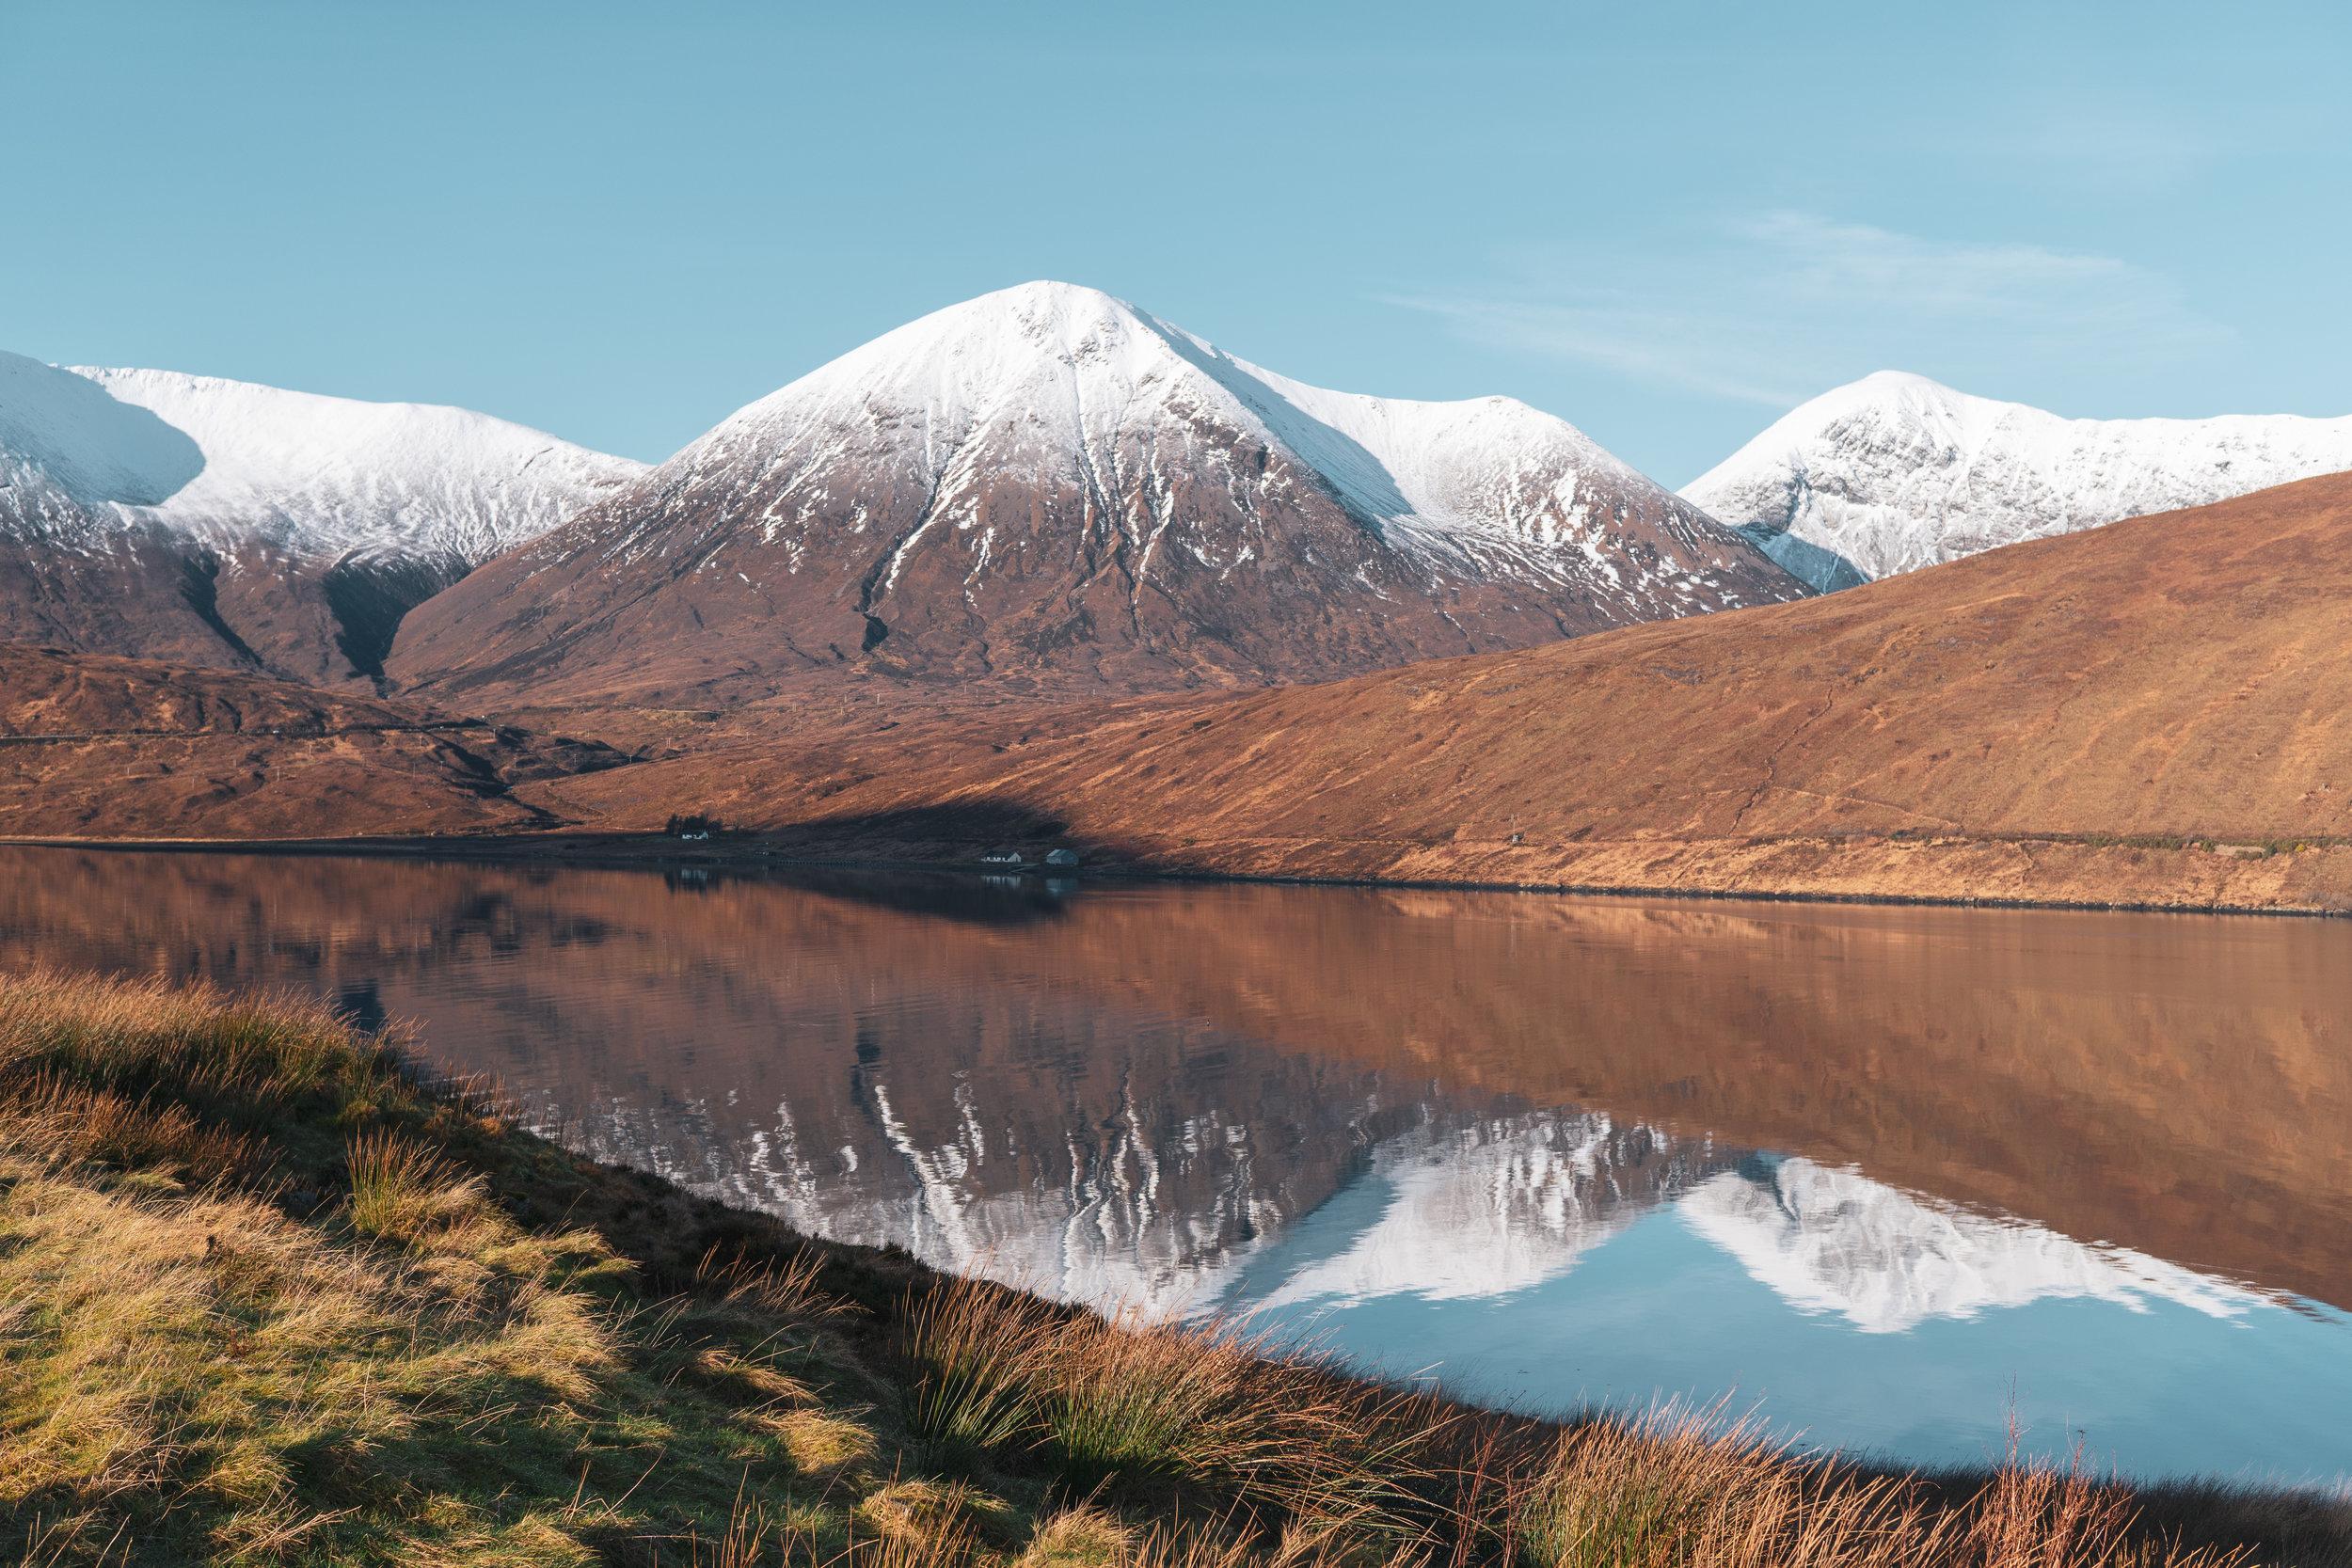 Isle-of-Skye-Eilean-Donan (6).jpg